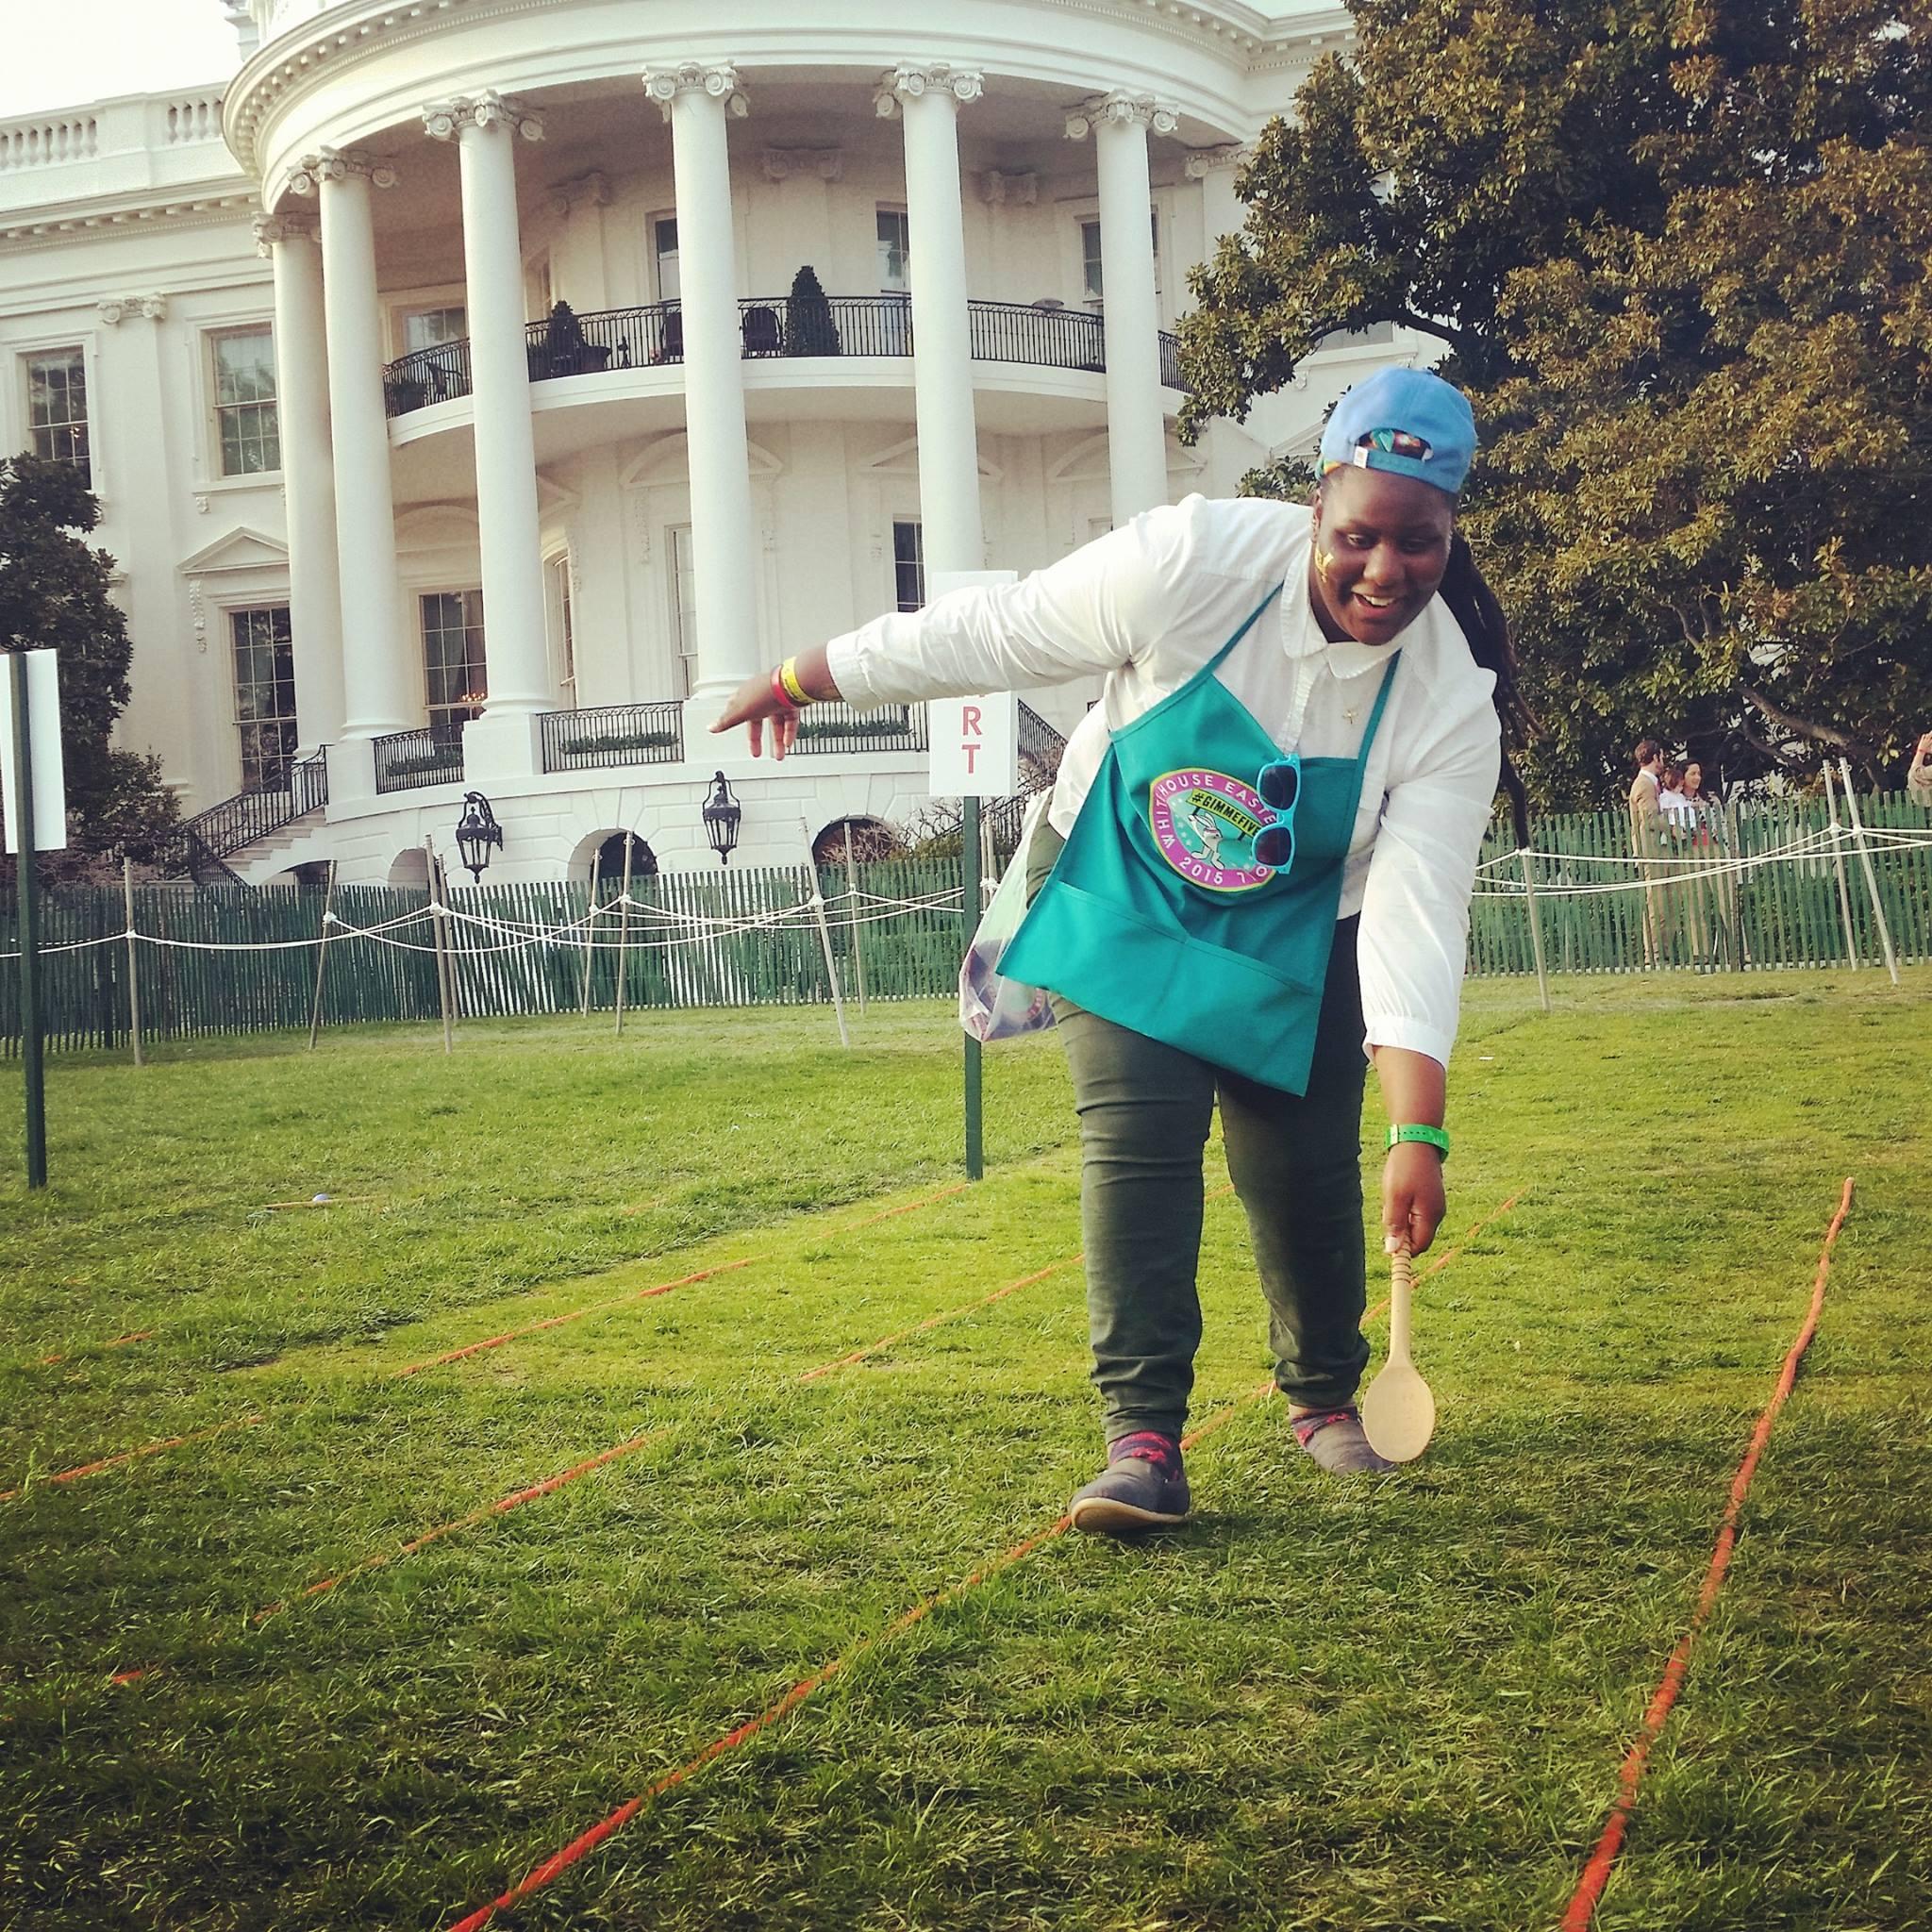 Easter Egg Roll (Obama Administration)